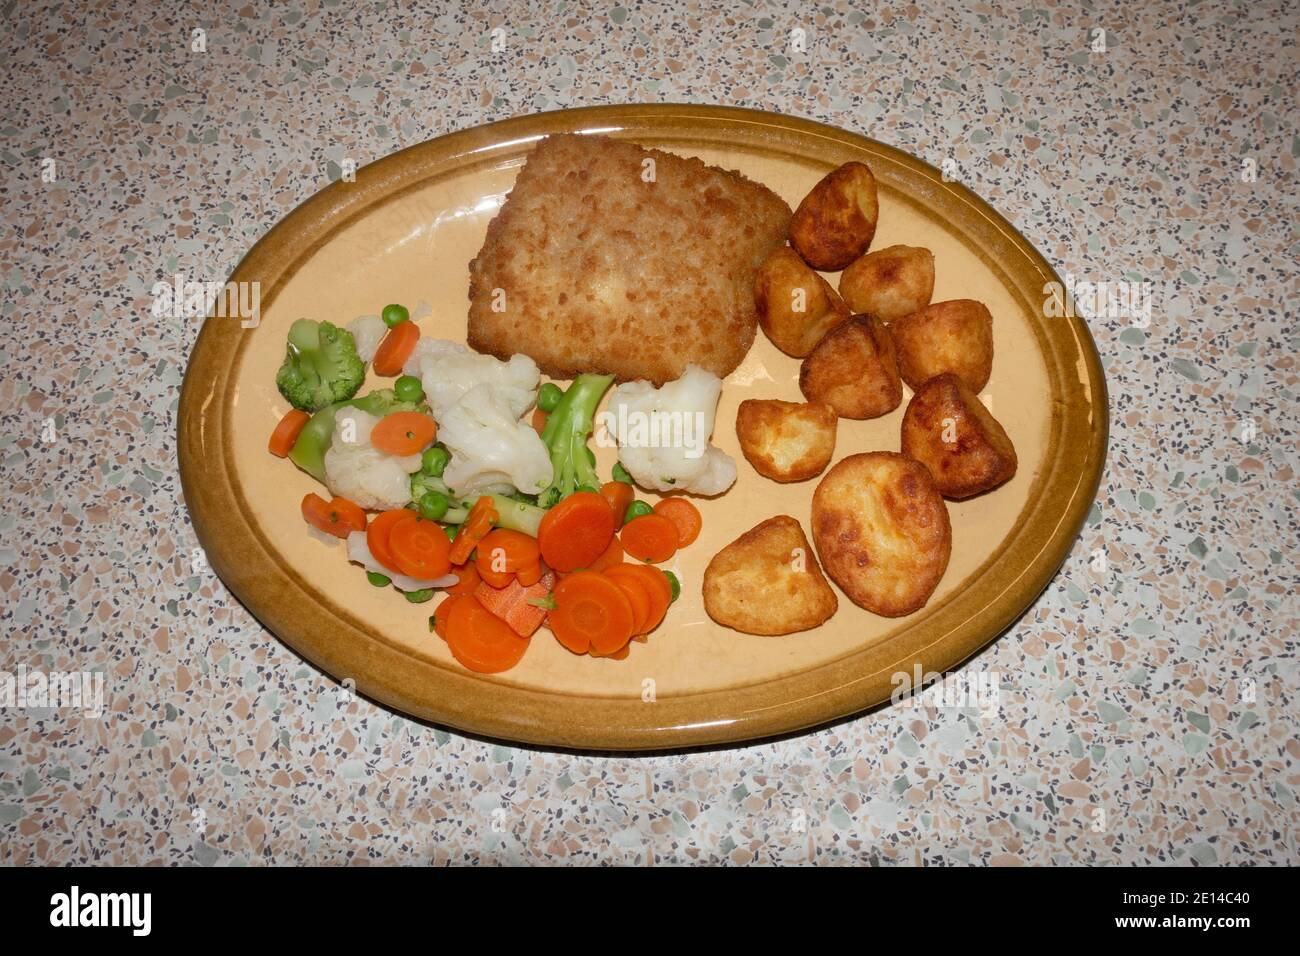 healthy-fish-dinner-2E14C40.jpg